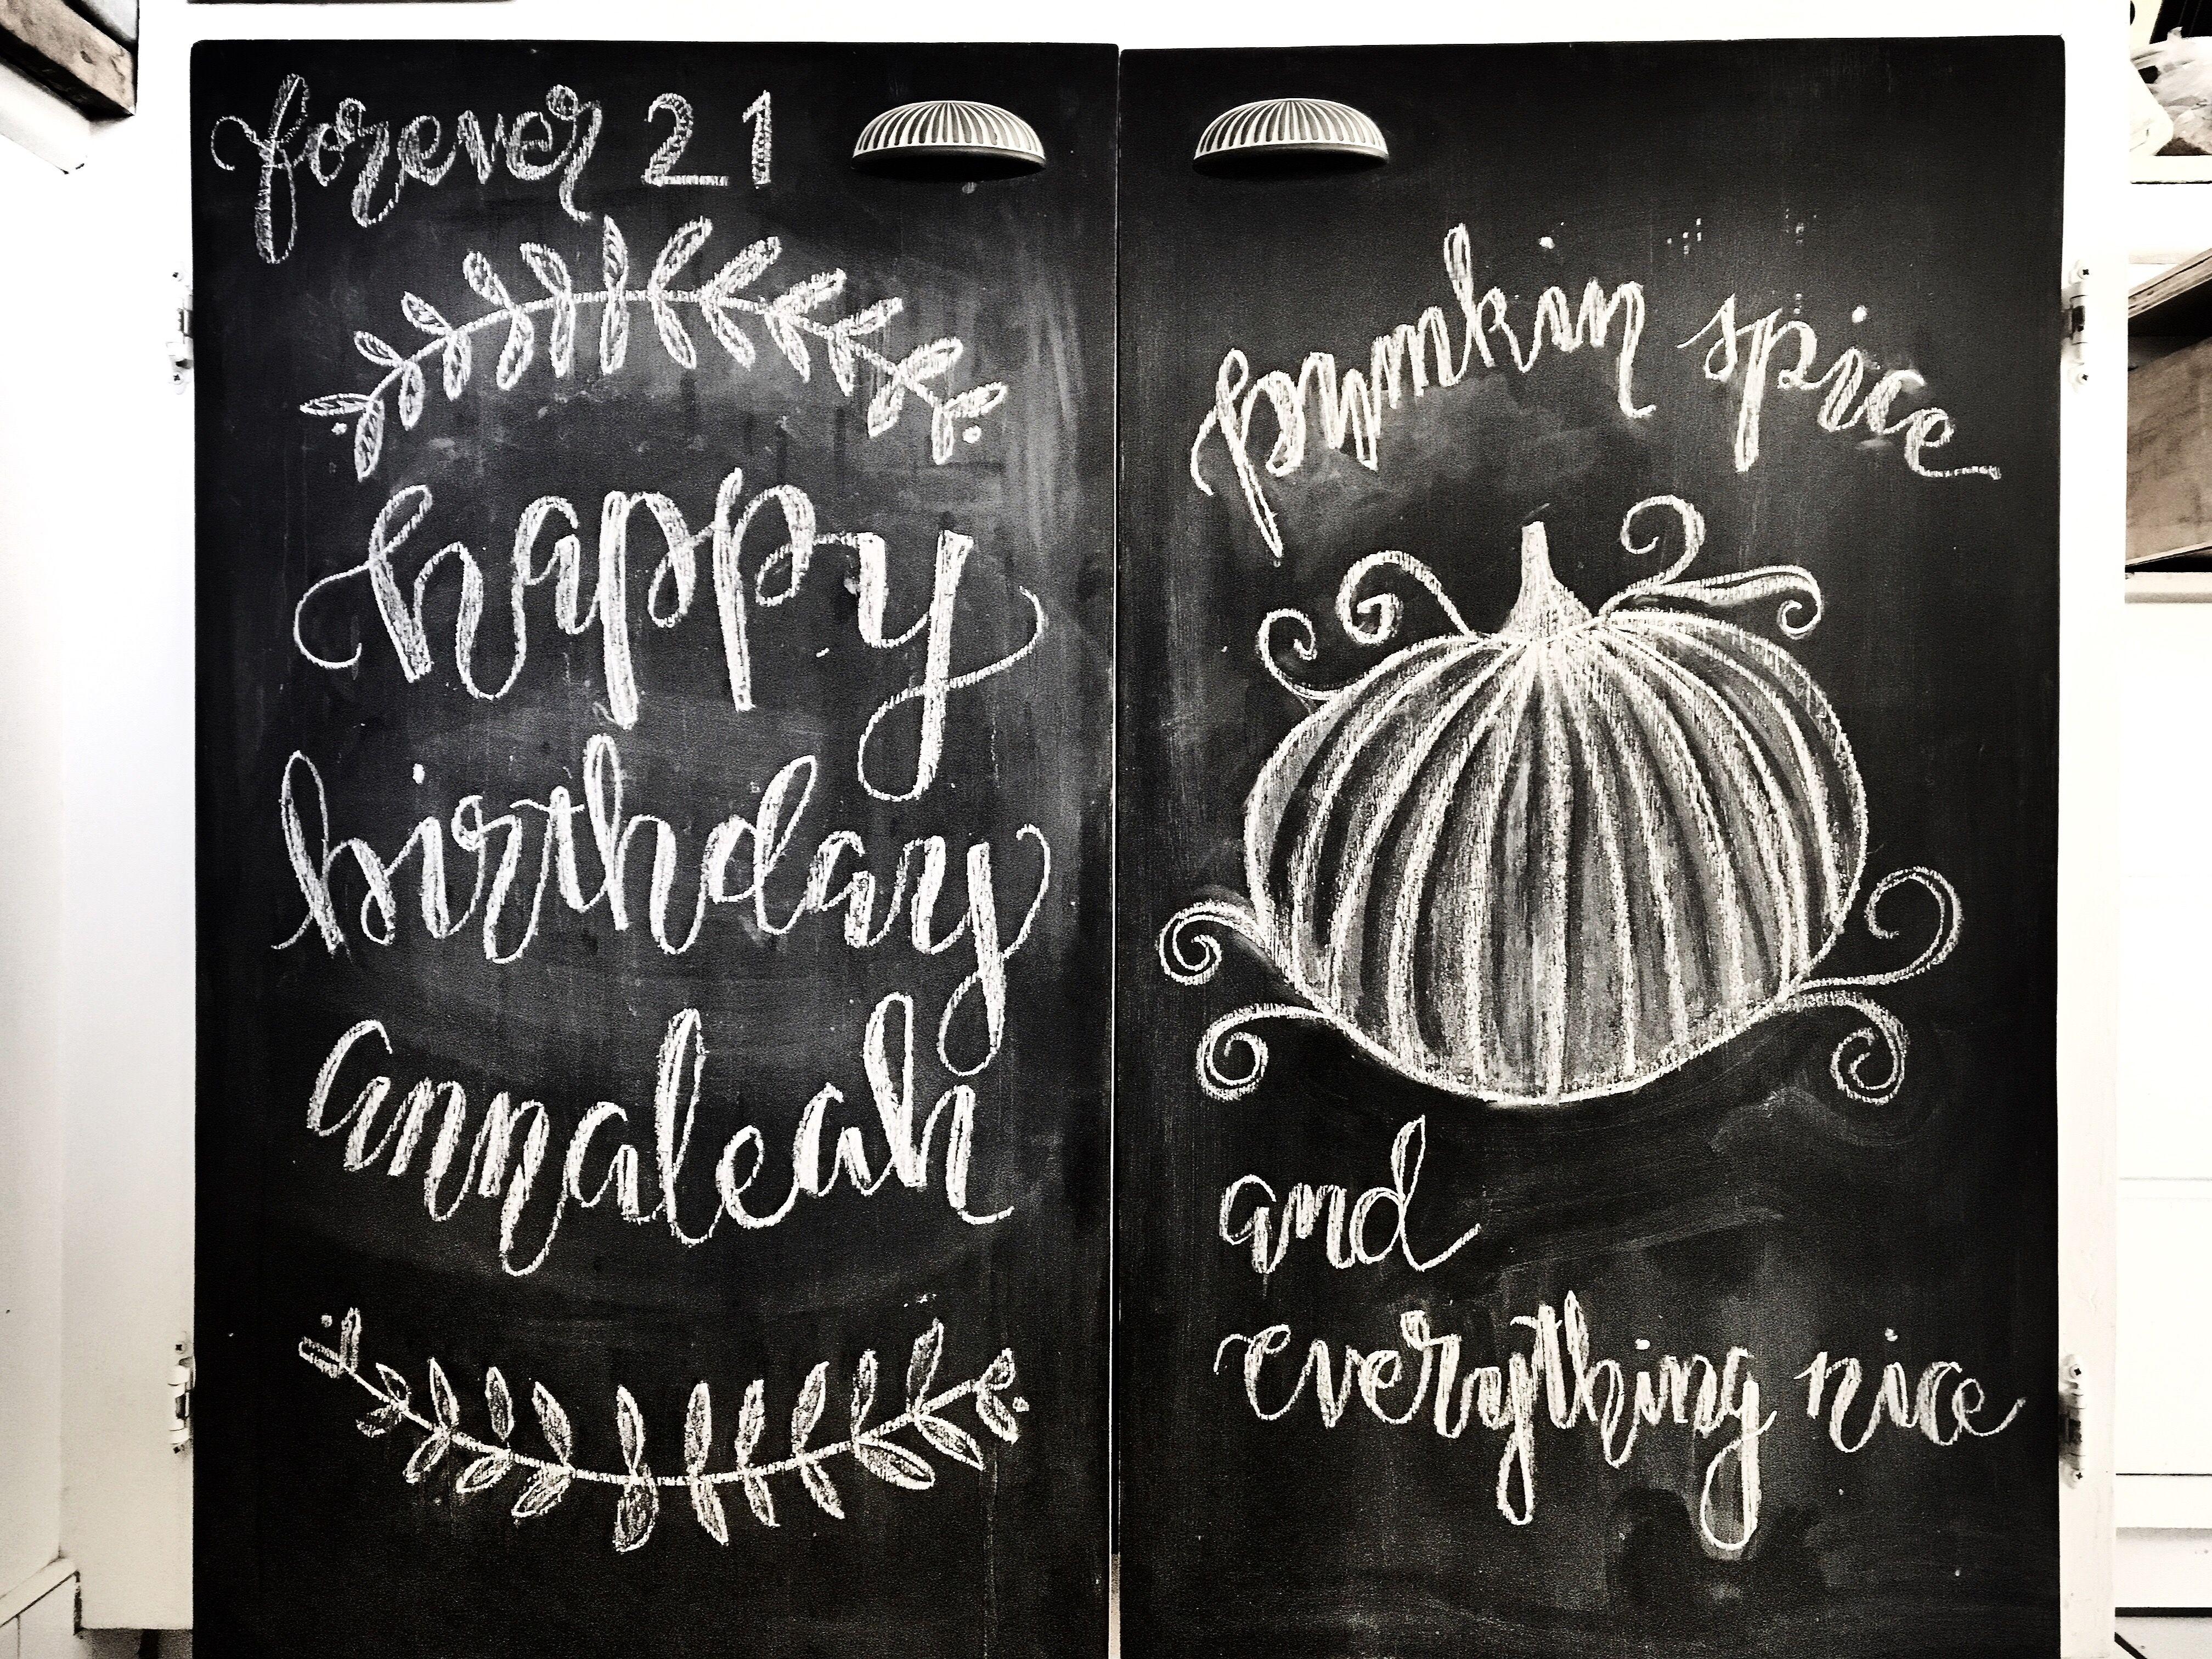 Chalkboard Art, Chalkboards, Fall Chalkboard Art, Chalkboard Sayings, Chalkboard, Writing